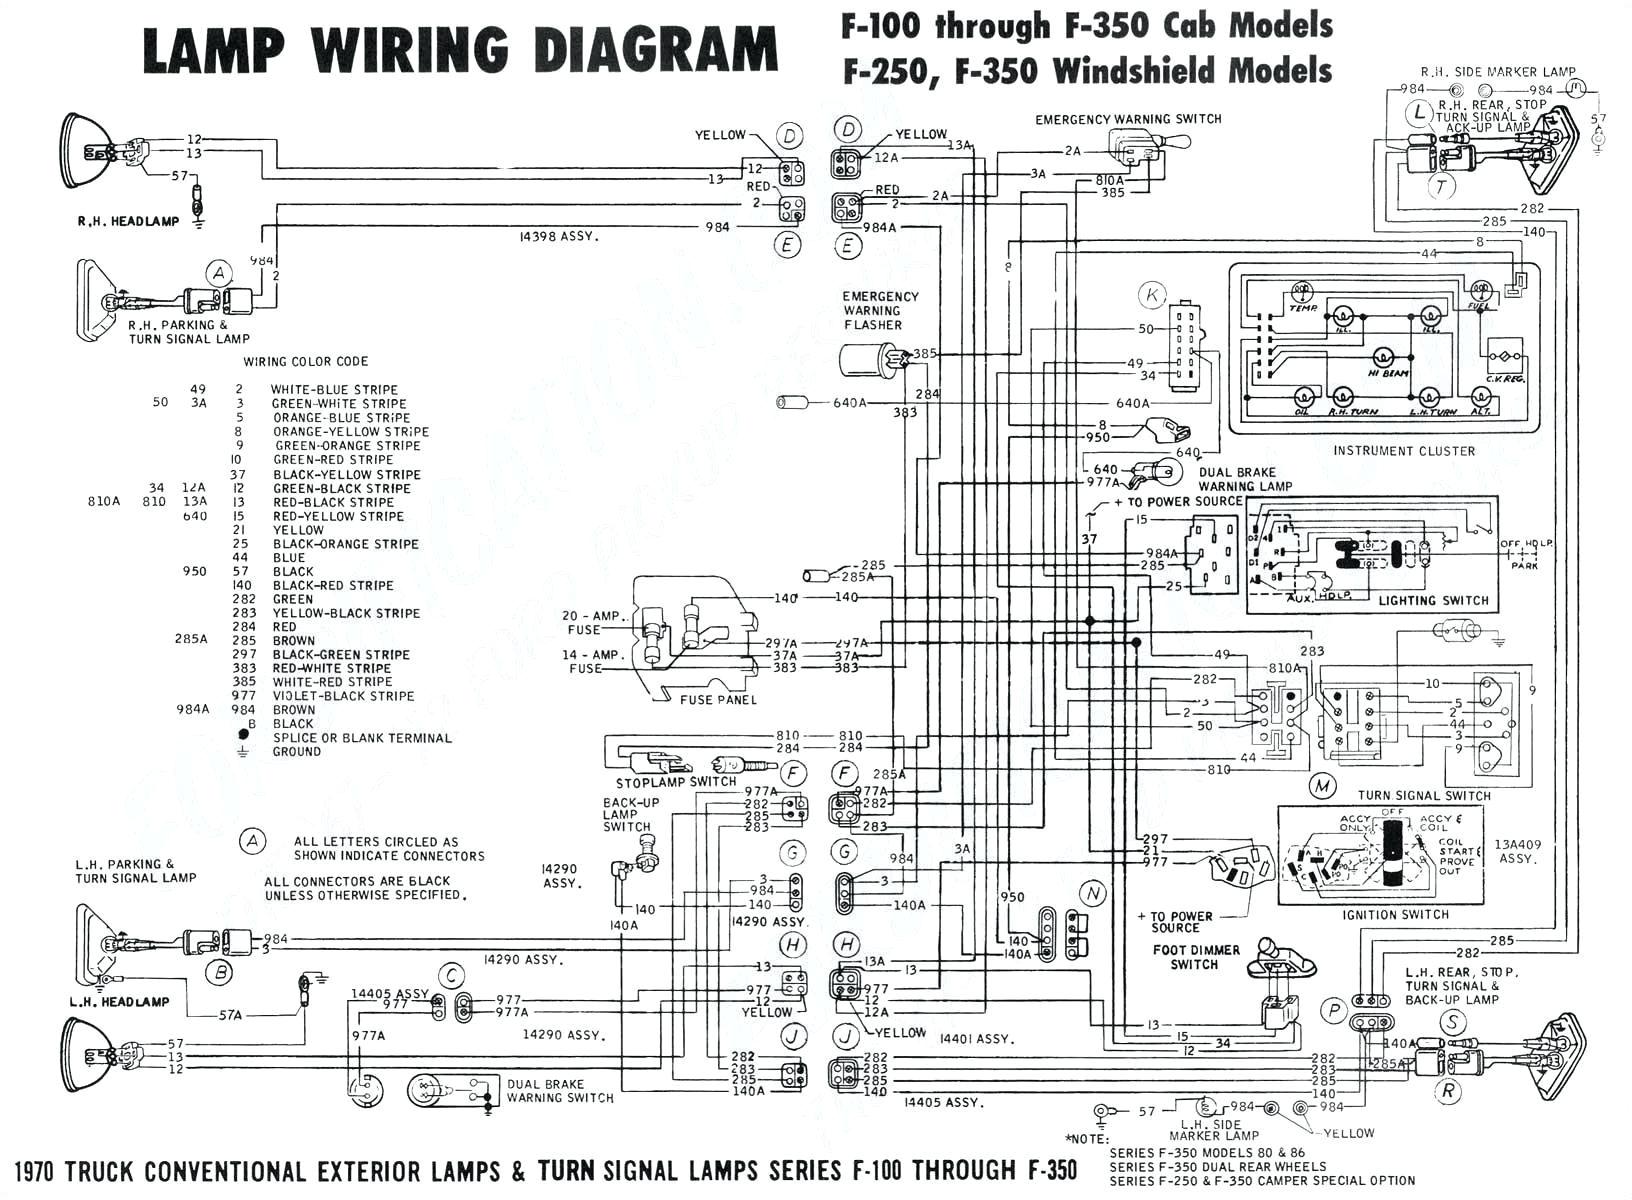 silverado 1500 turn signal switch likewise 1997 ford f 150 wiring 1997 ford f 150 fuel pump relay as well 2008 ford f 250 mirror wiring